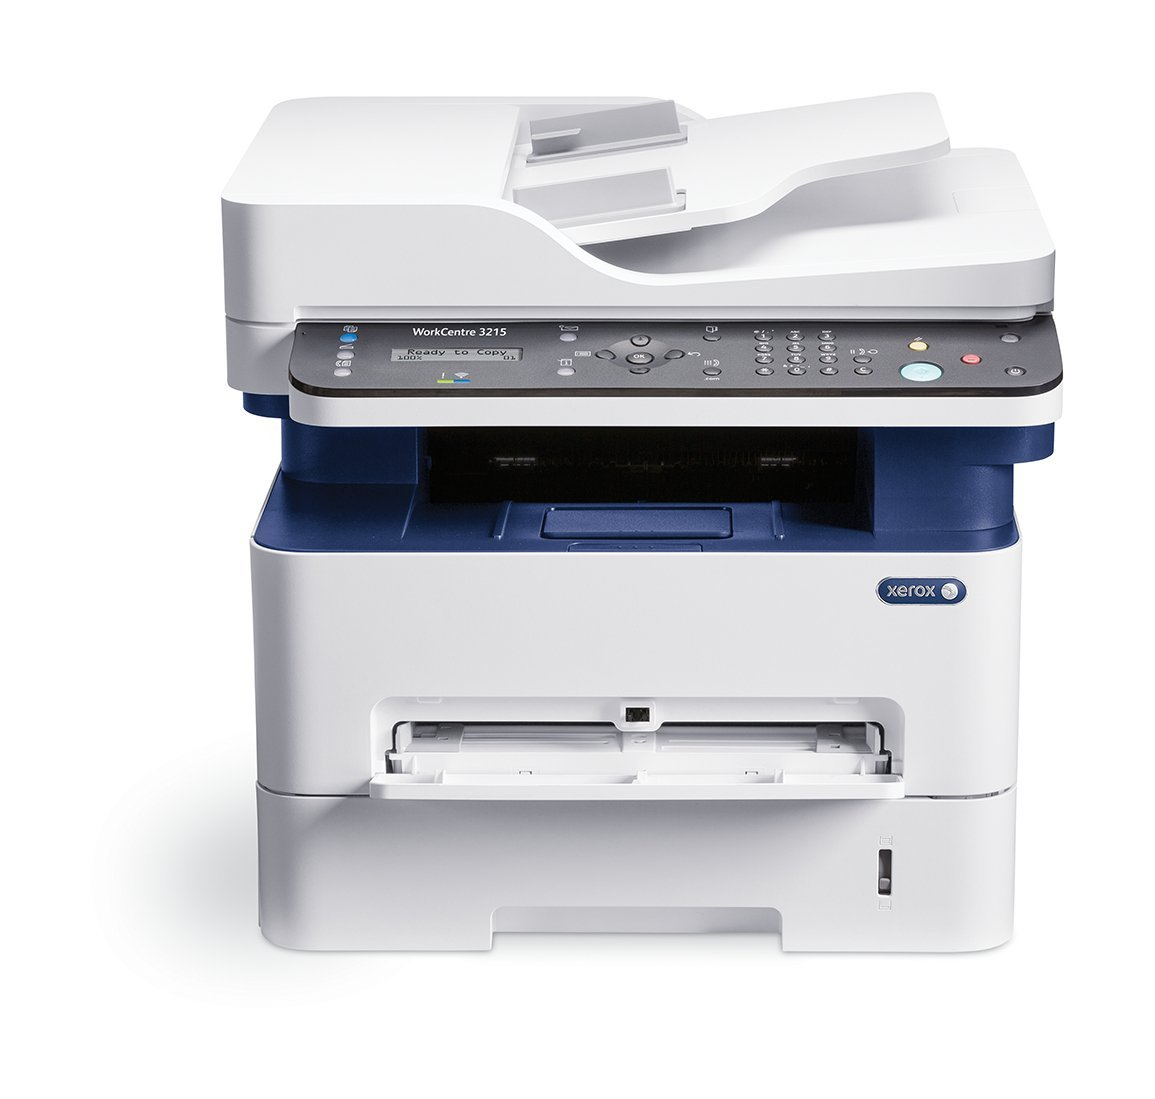 Xerox WorkCentre 3215/NI Monochrome Multifunction Printer (Renewed) by Xerox (Image #1)